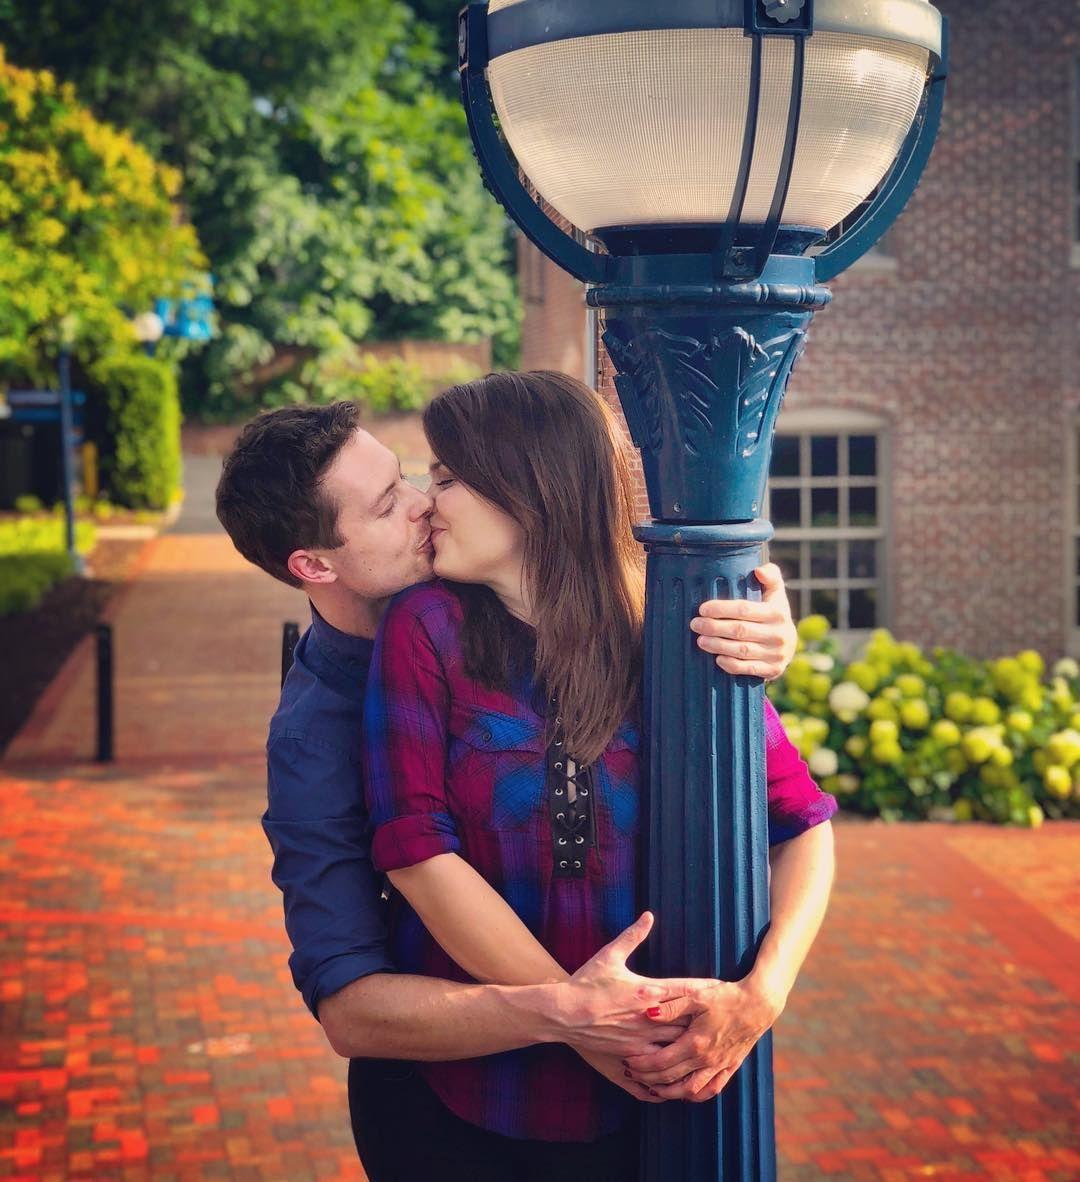 Kimberly J. Brown and Daniel Kountz — who costarred in the